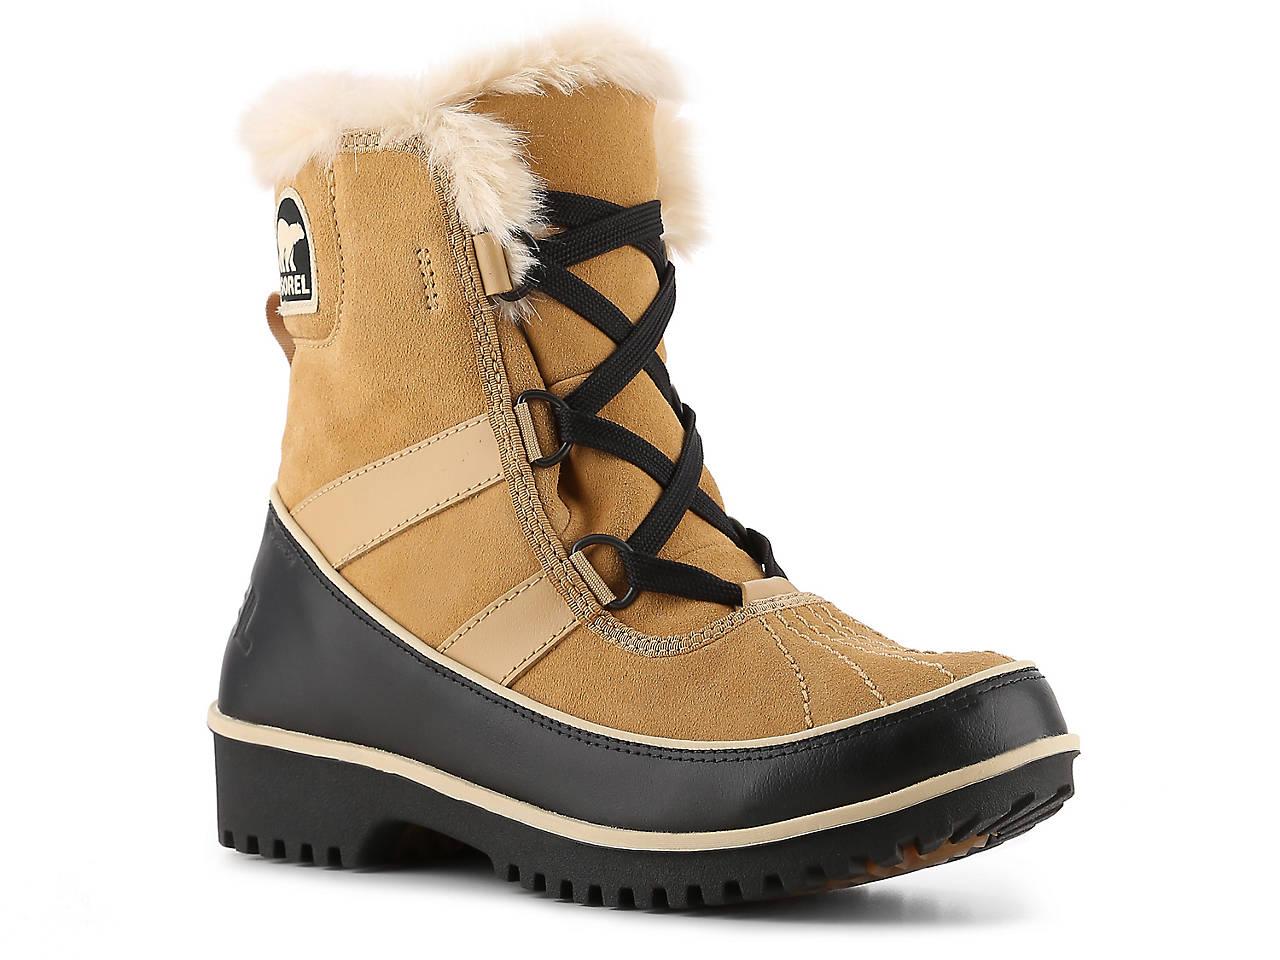 b7bb87b98b93 Sorel Tivoli II Snow Boot Women s Shoes